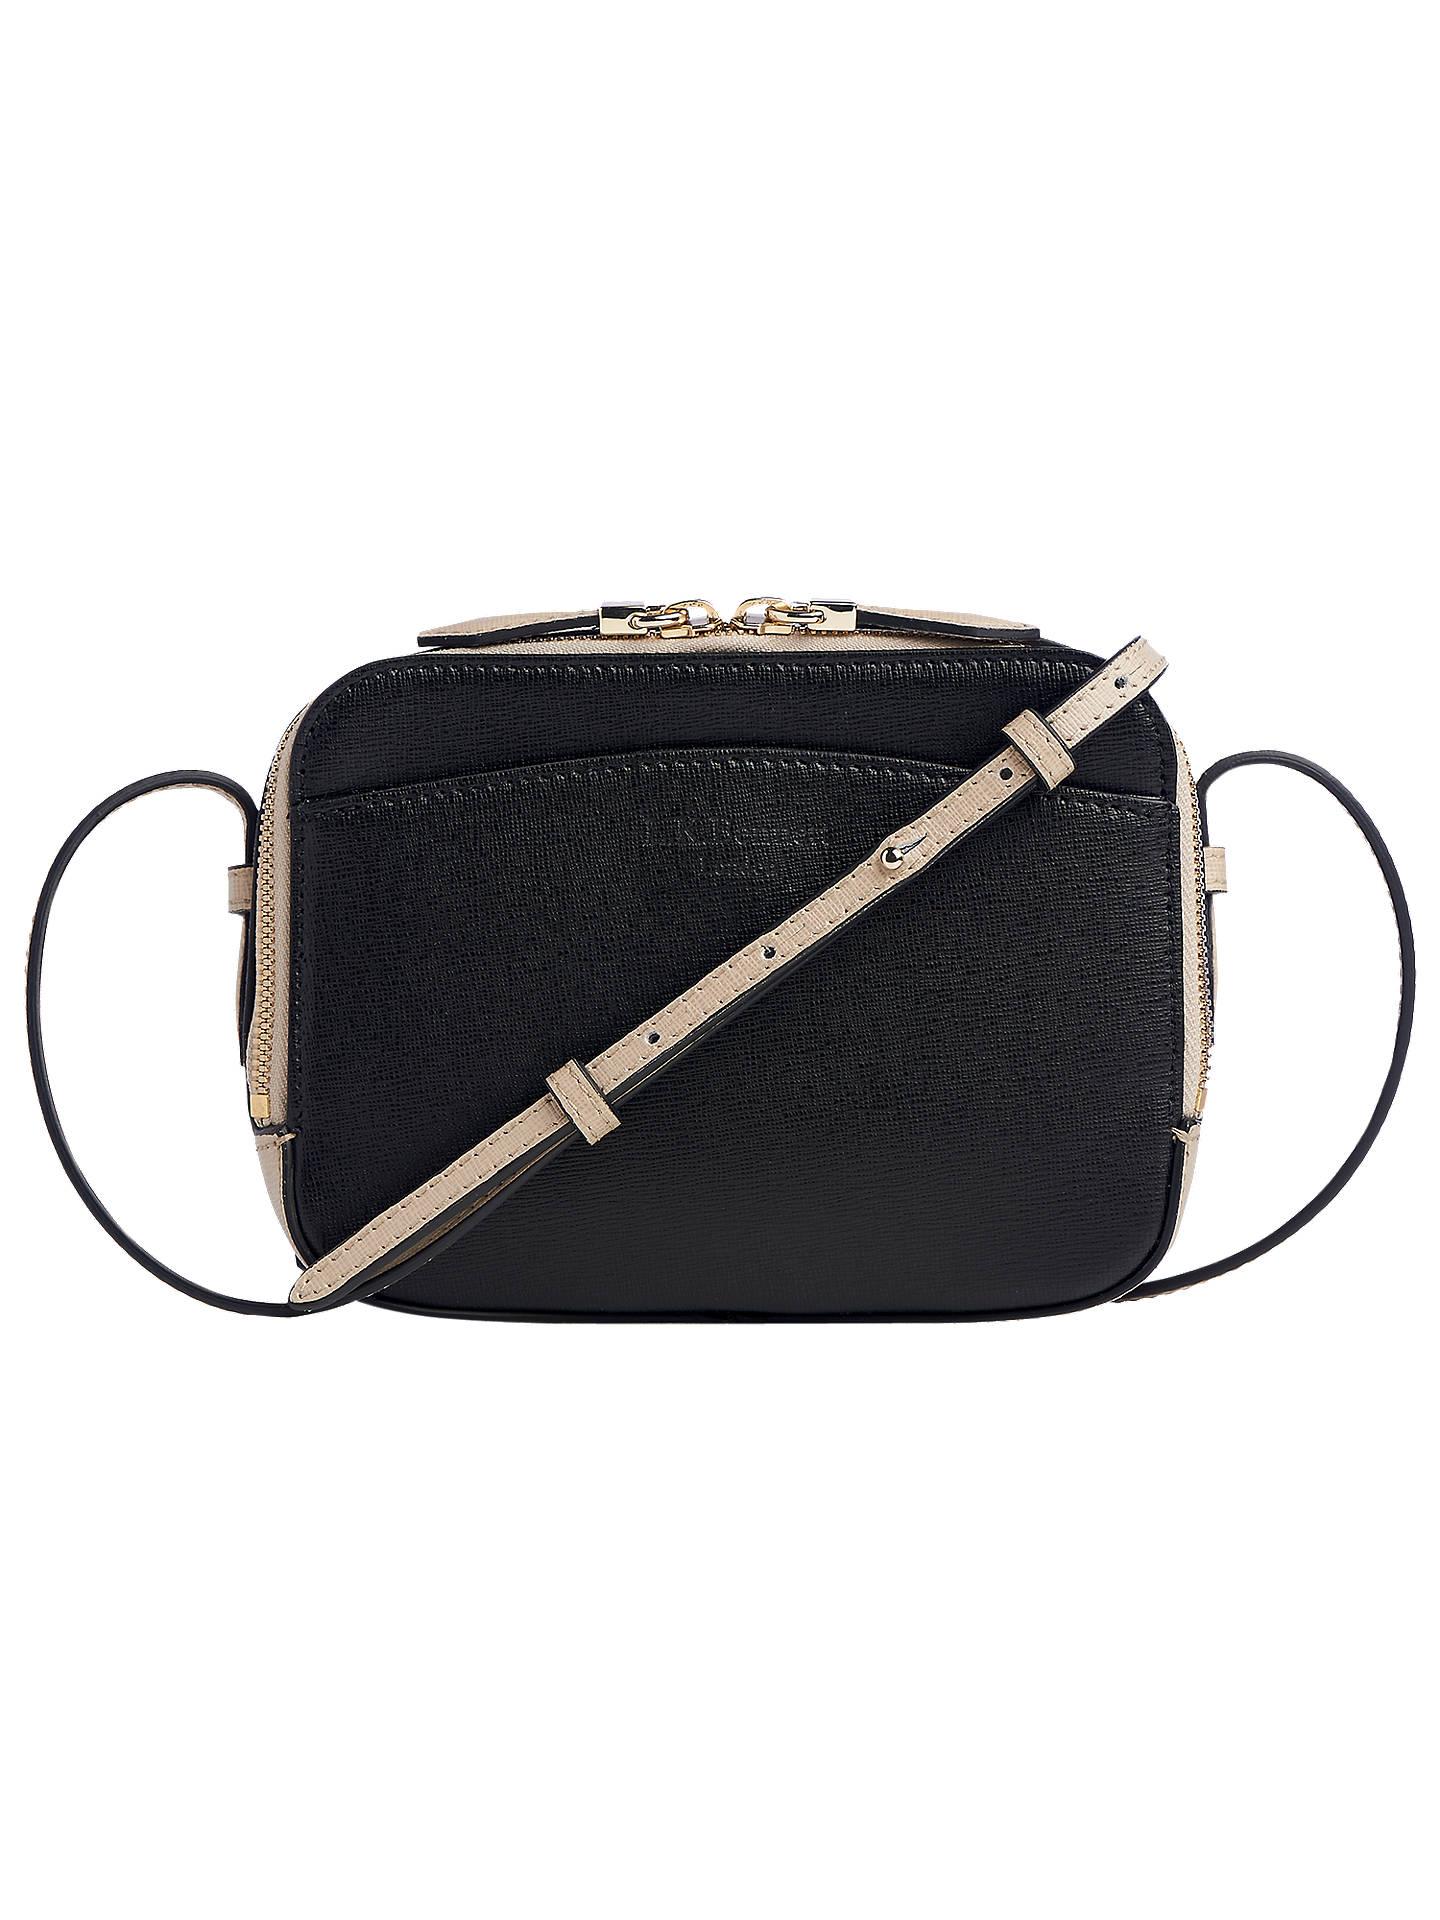 329b2ebb8157 Buy L.K.Bennett Mariel Leather Cross Body Bag, Taupe/Black Online at  johnlewis.